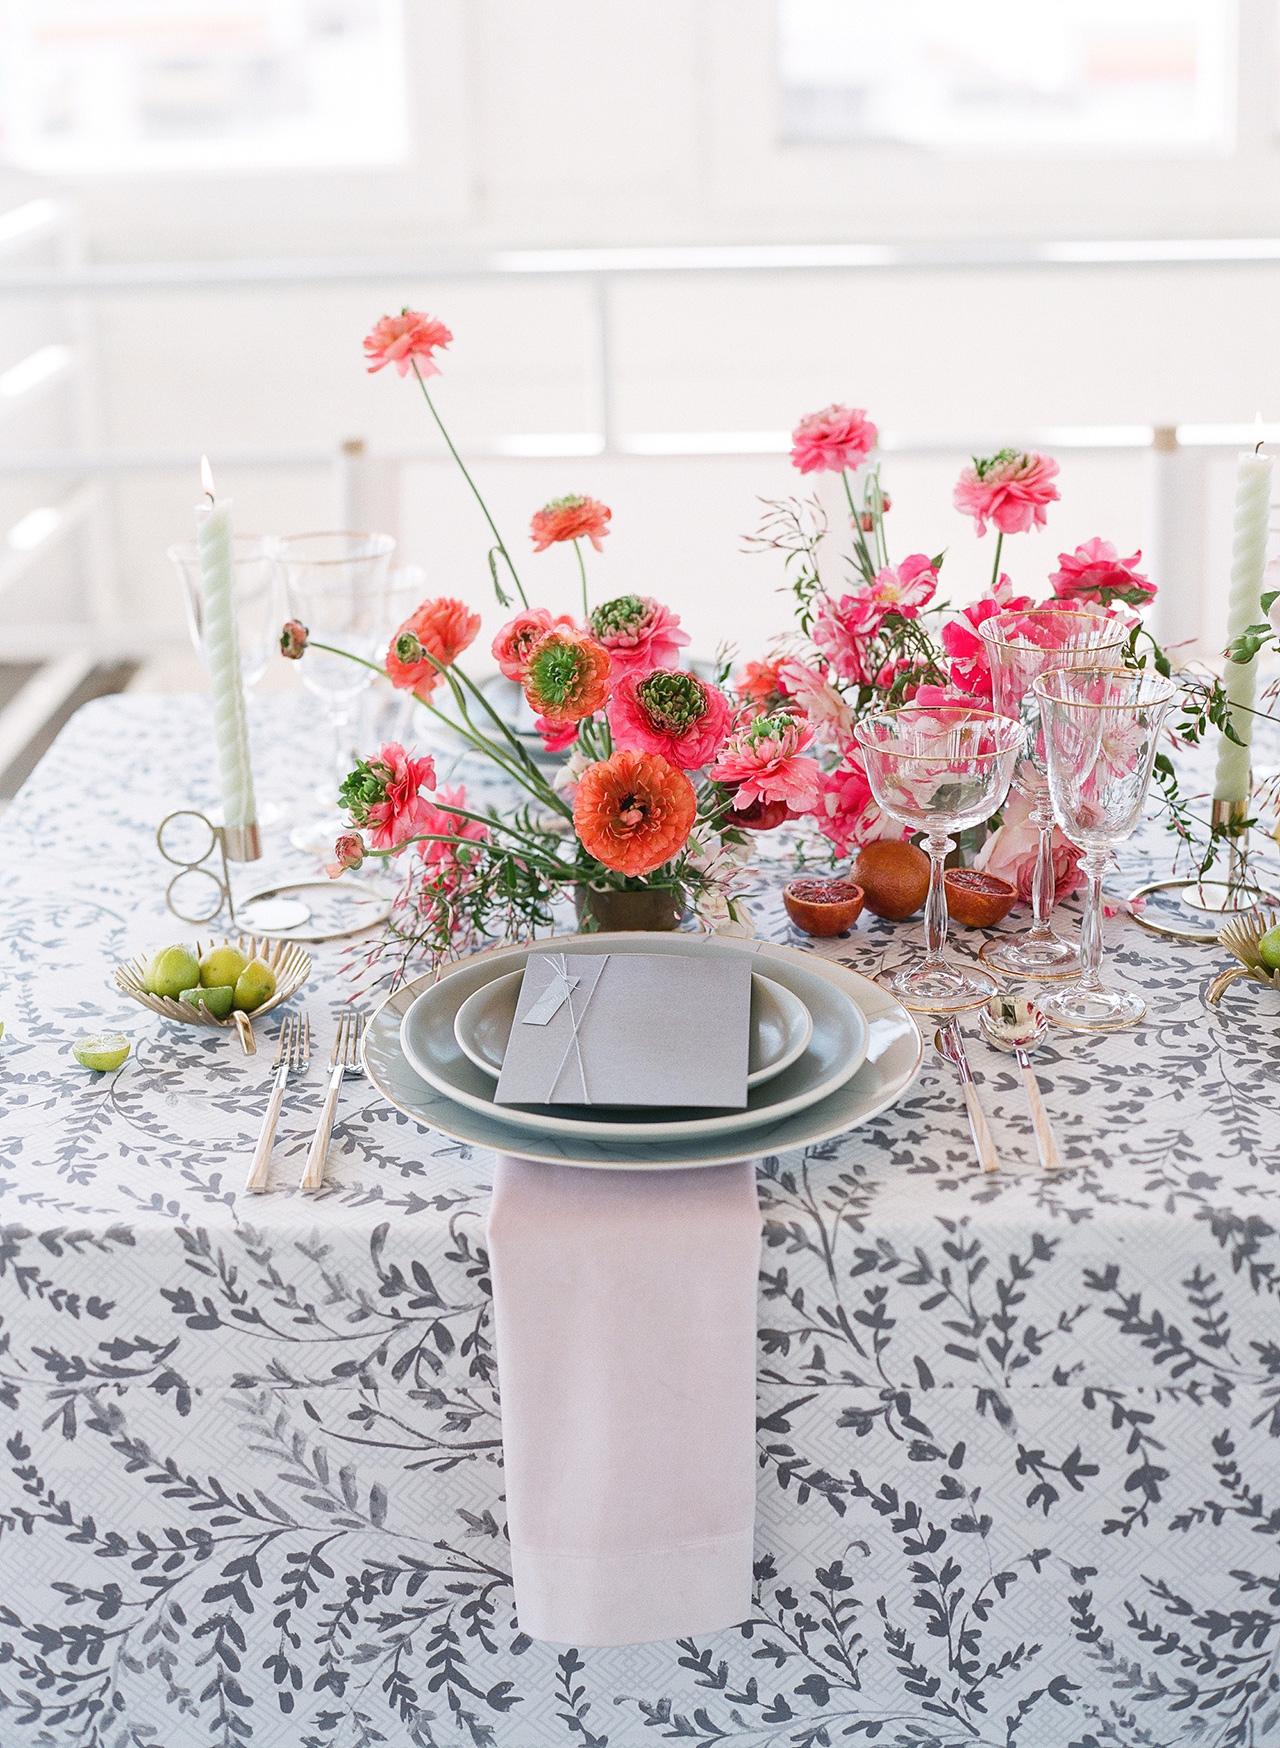 pink orange floral centerpiece creative tablespace